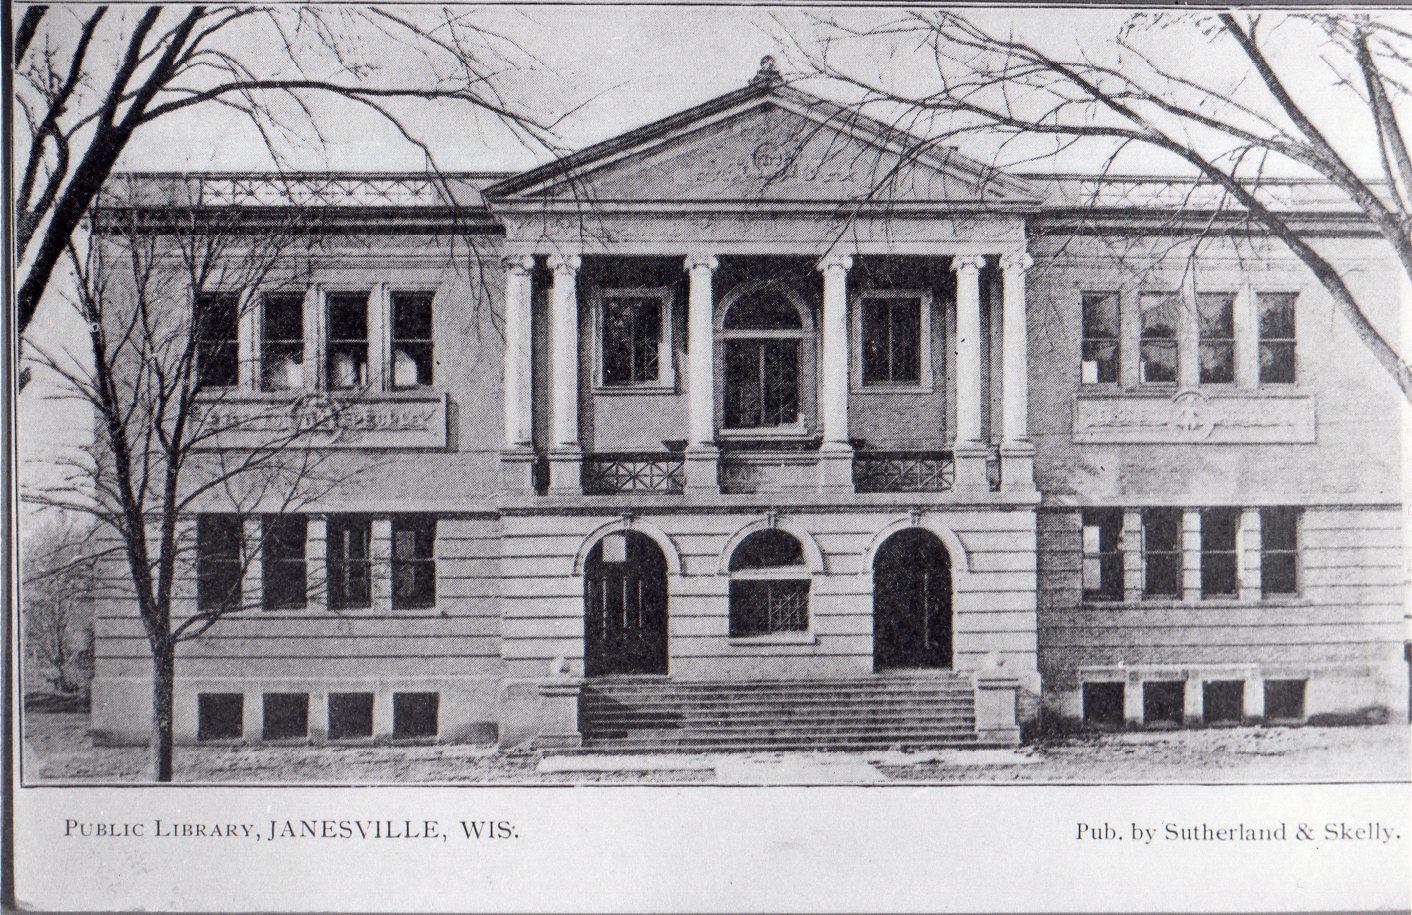 Janesville Public Library: Postcard